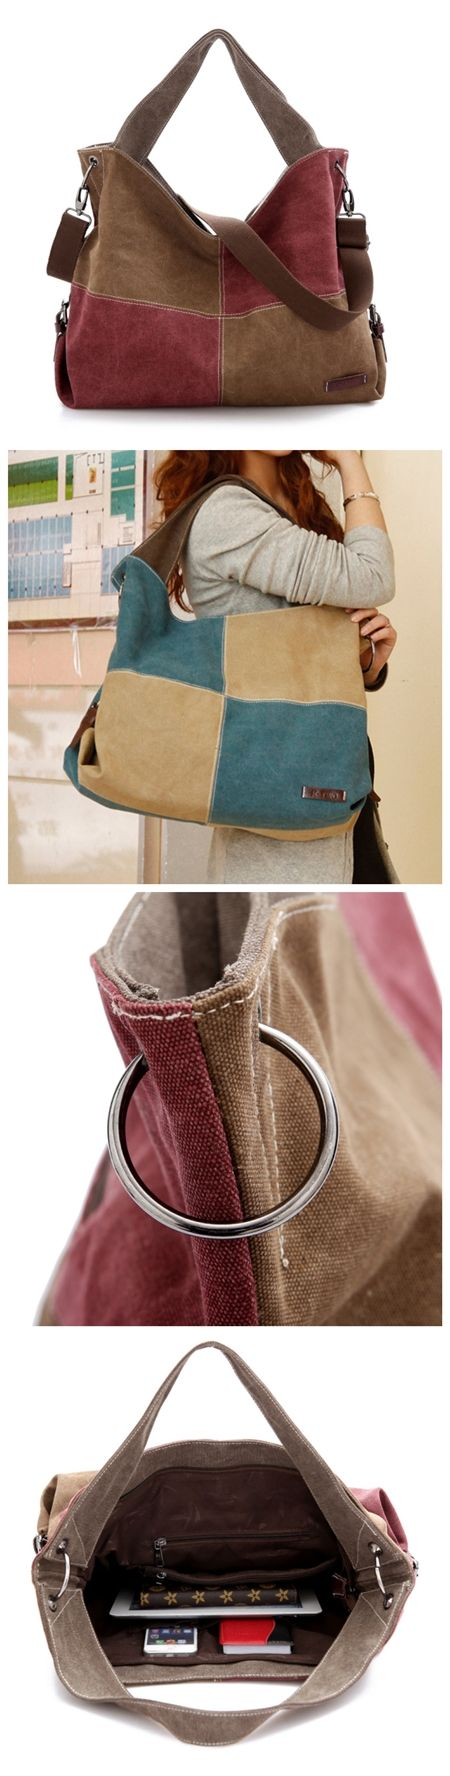 Fashion Women's Contrast Color Canvas Casual Hobo Tote Handbag Shoulder Bags Bagail.com